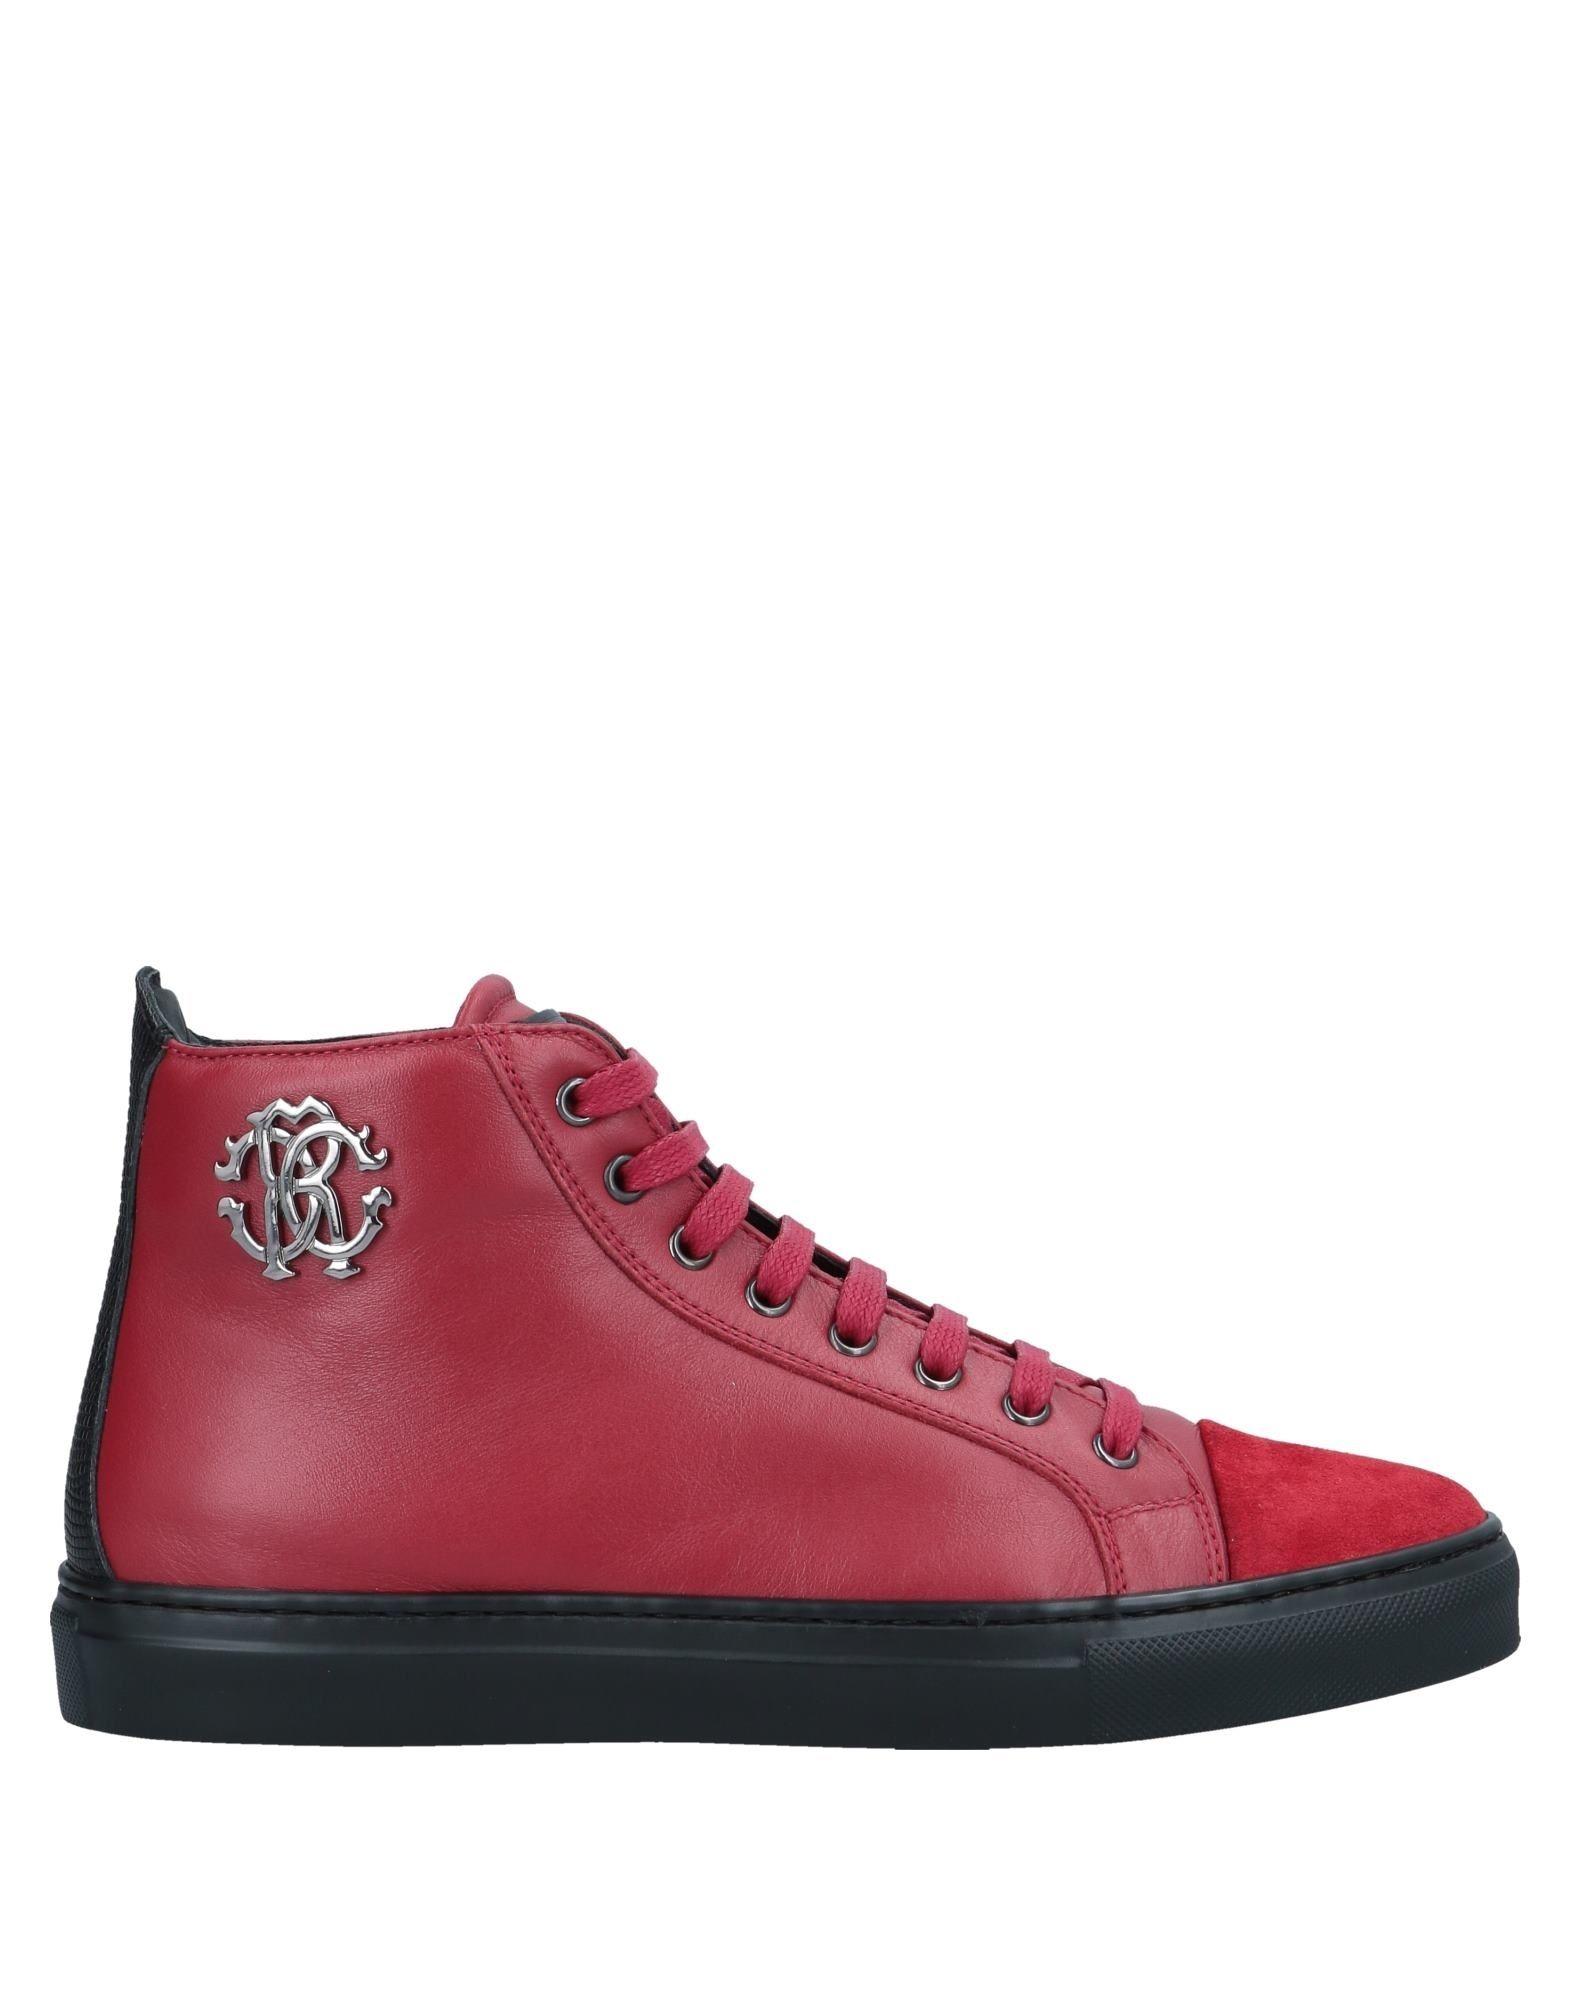 Roberto Cavalli Sneakers - Men Roberto Cavalli Sneakers online 11577287SD on  Canada - 11577287SD online cbc7e7